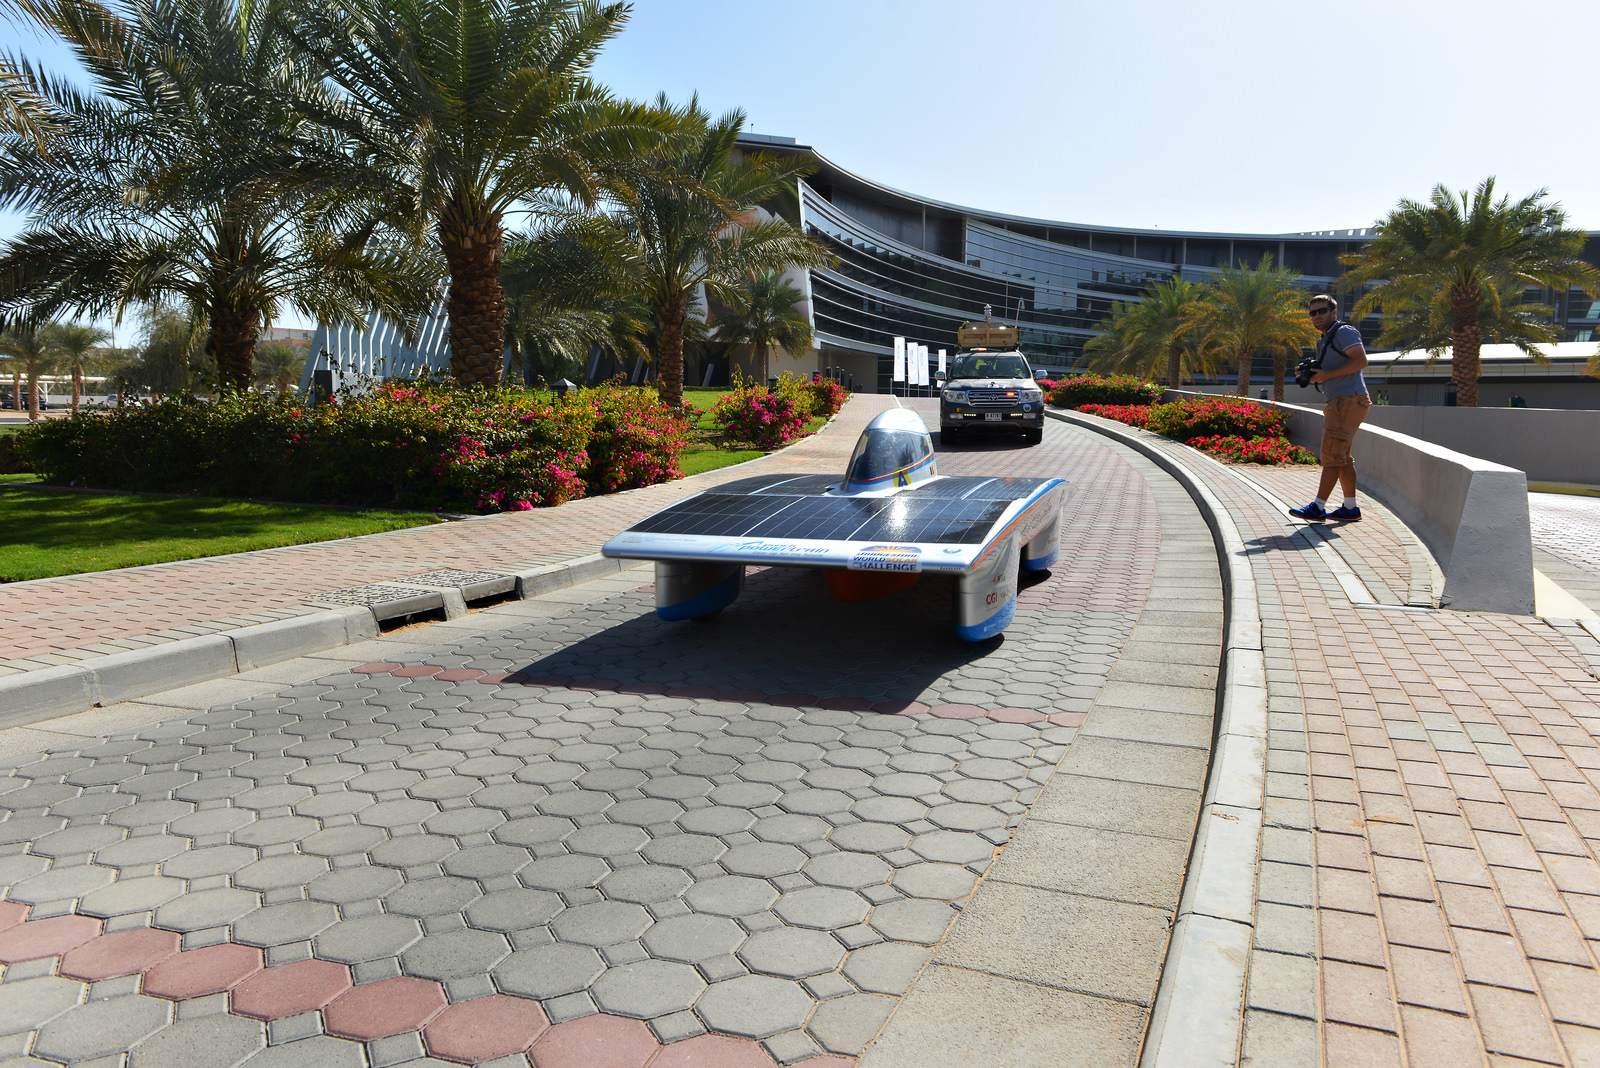 solar challenge8 Abu Dhabi Solar Challenge   Victory for Michigan University Team